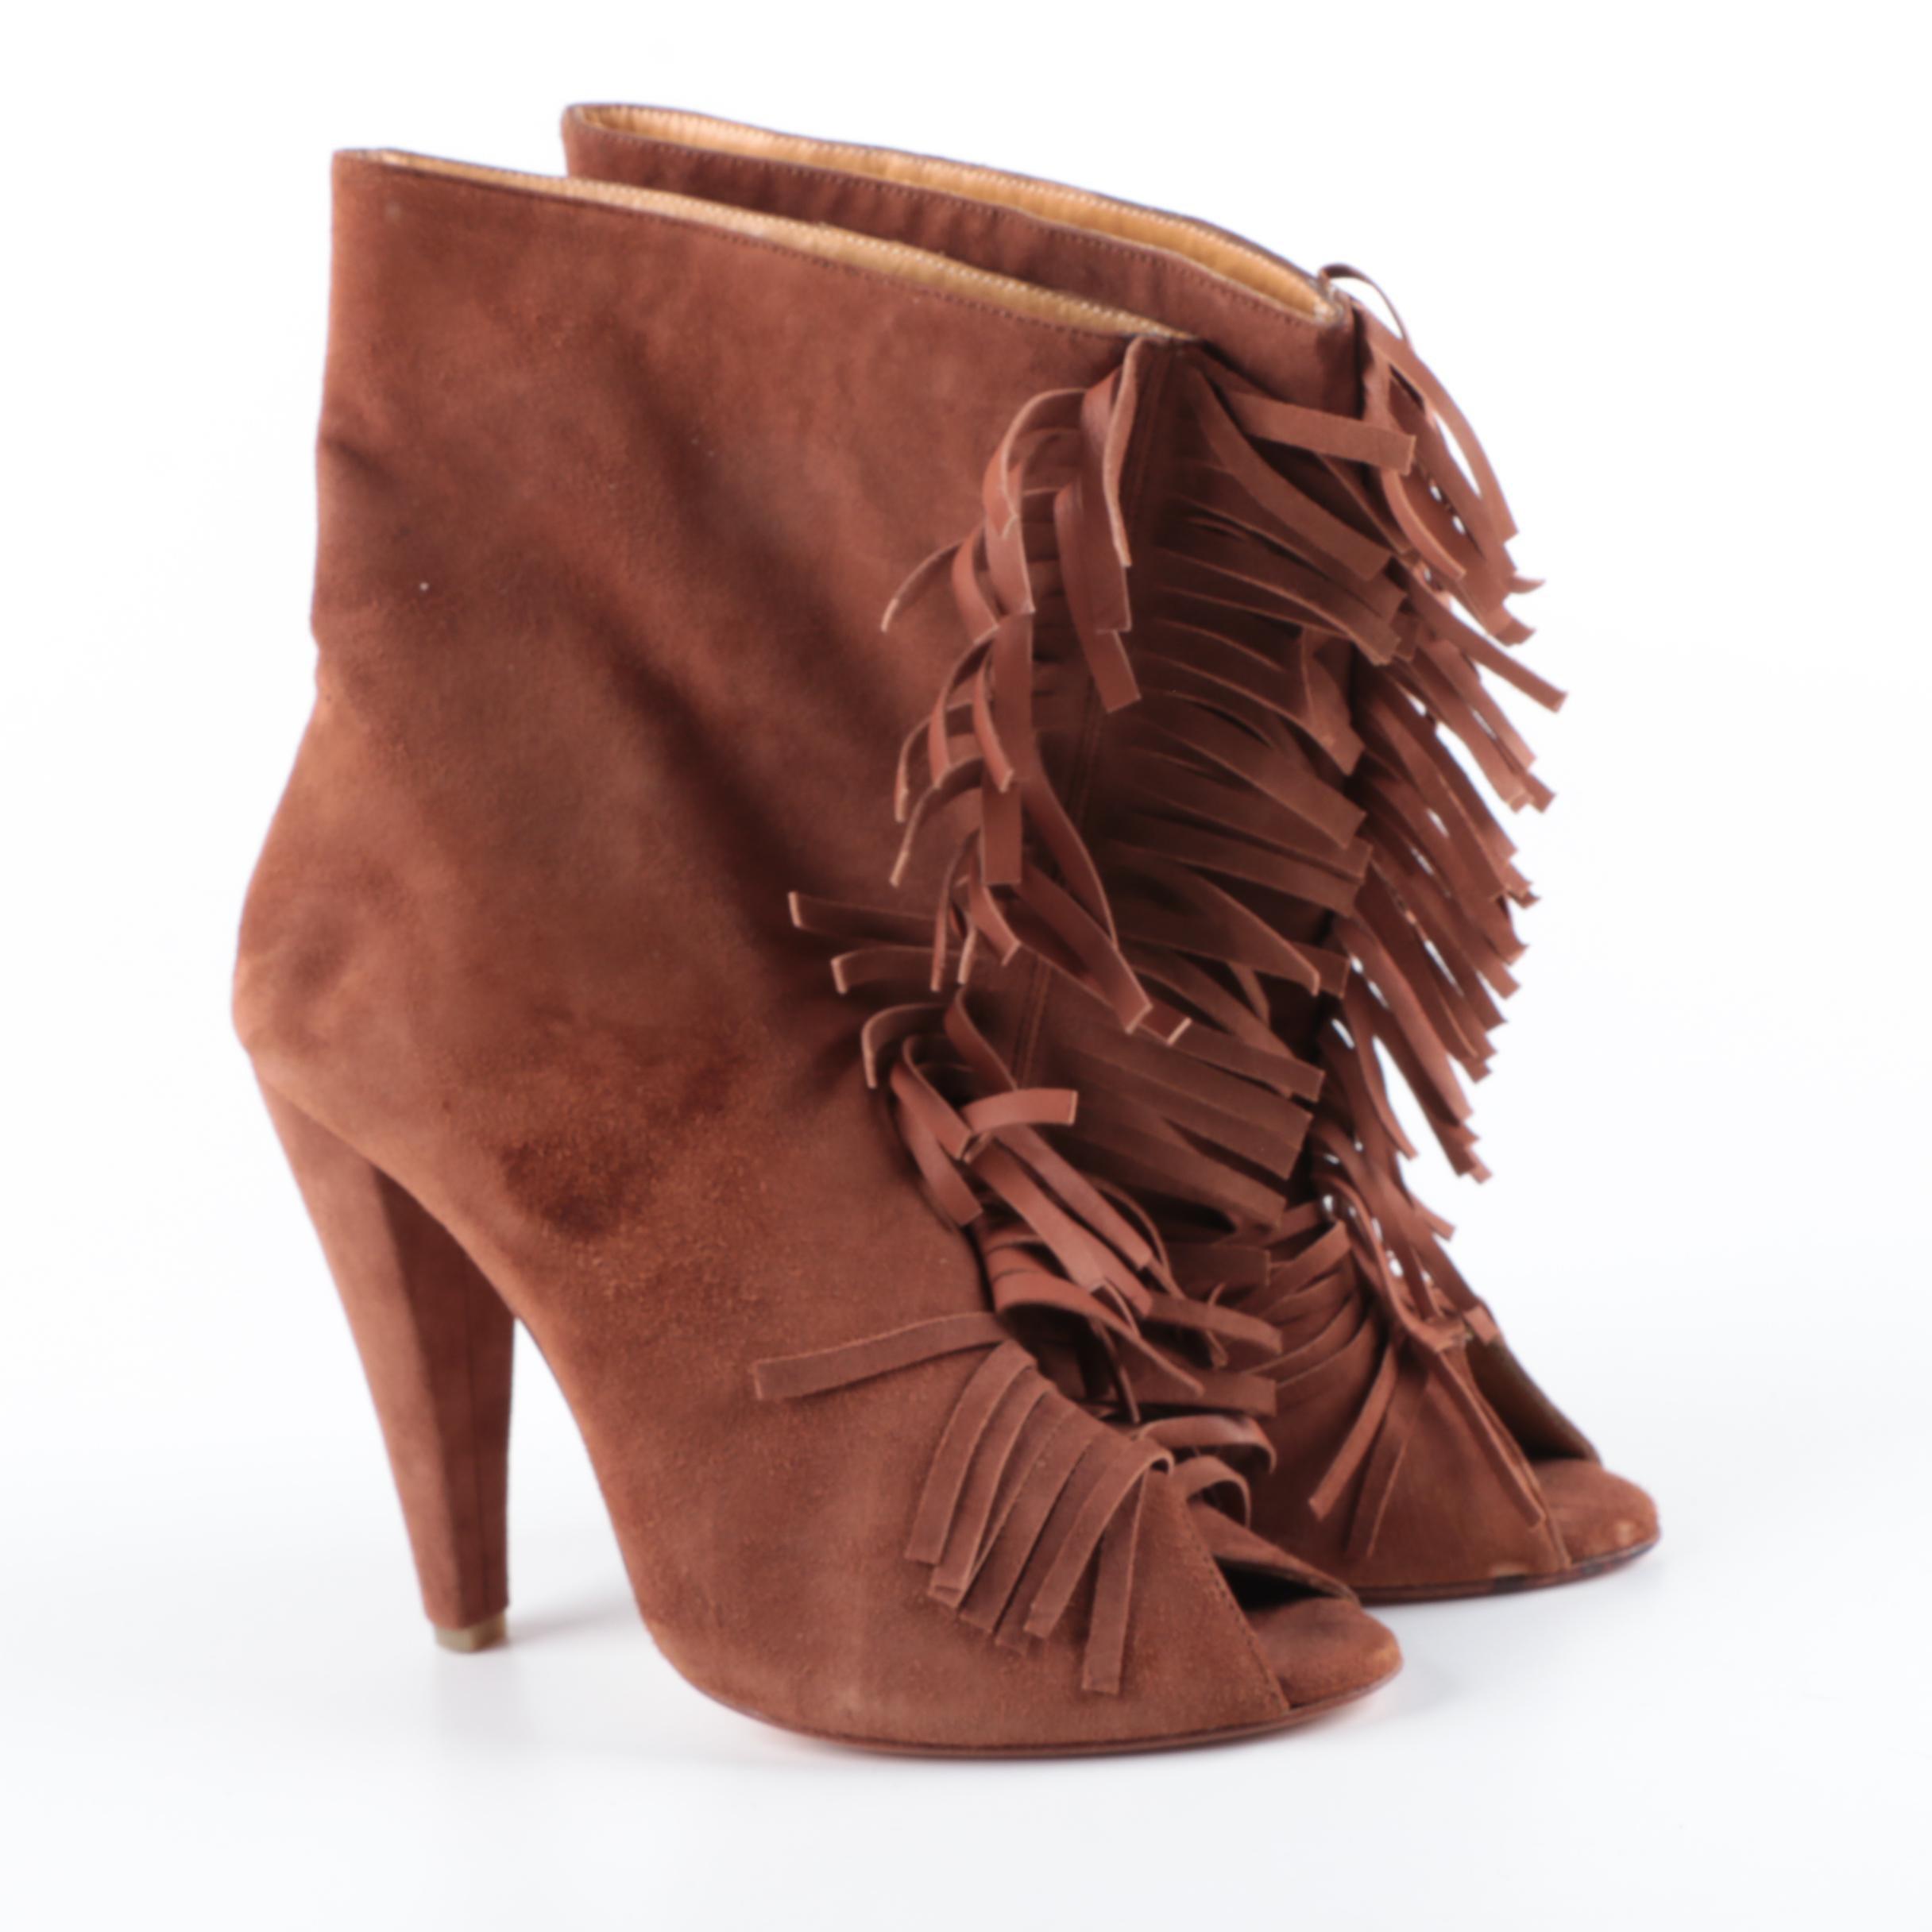 Plomo Suede Fringe Peep Toe Boots